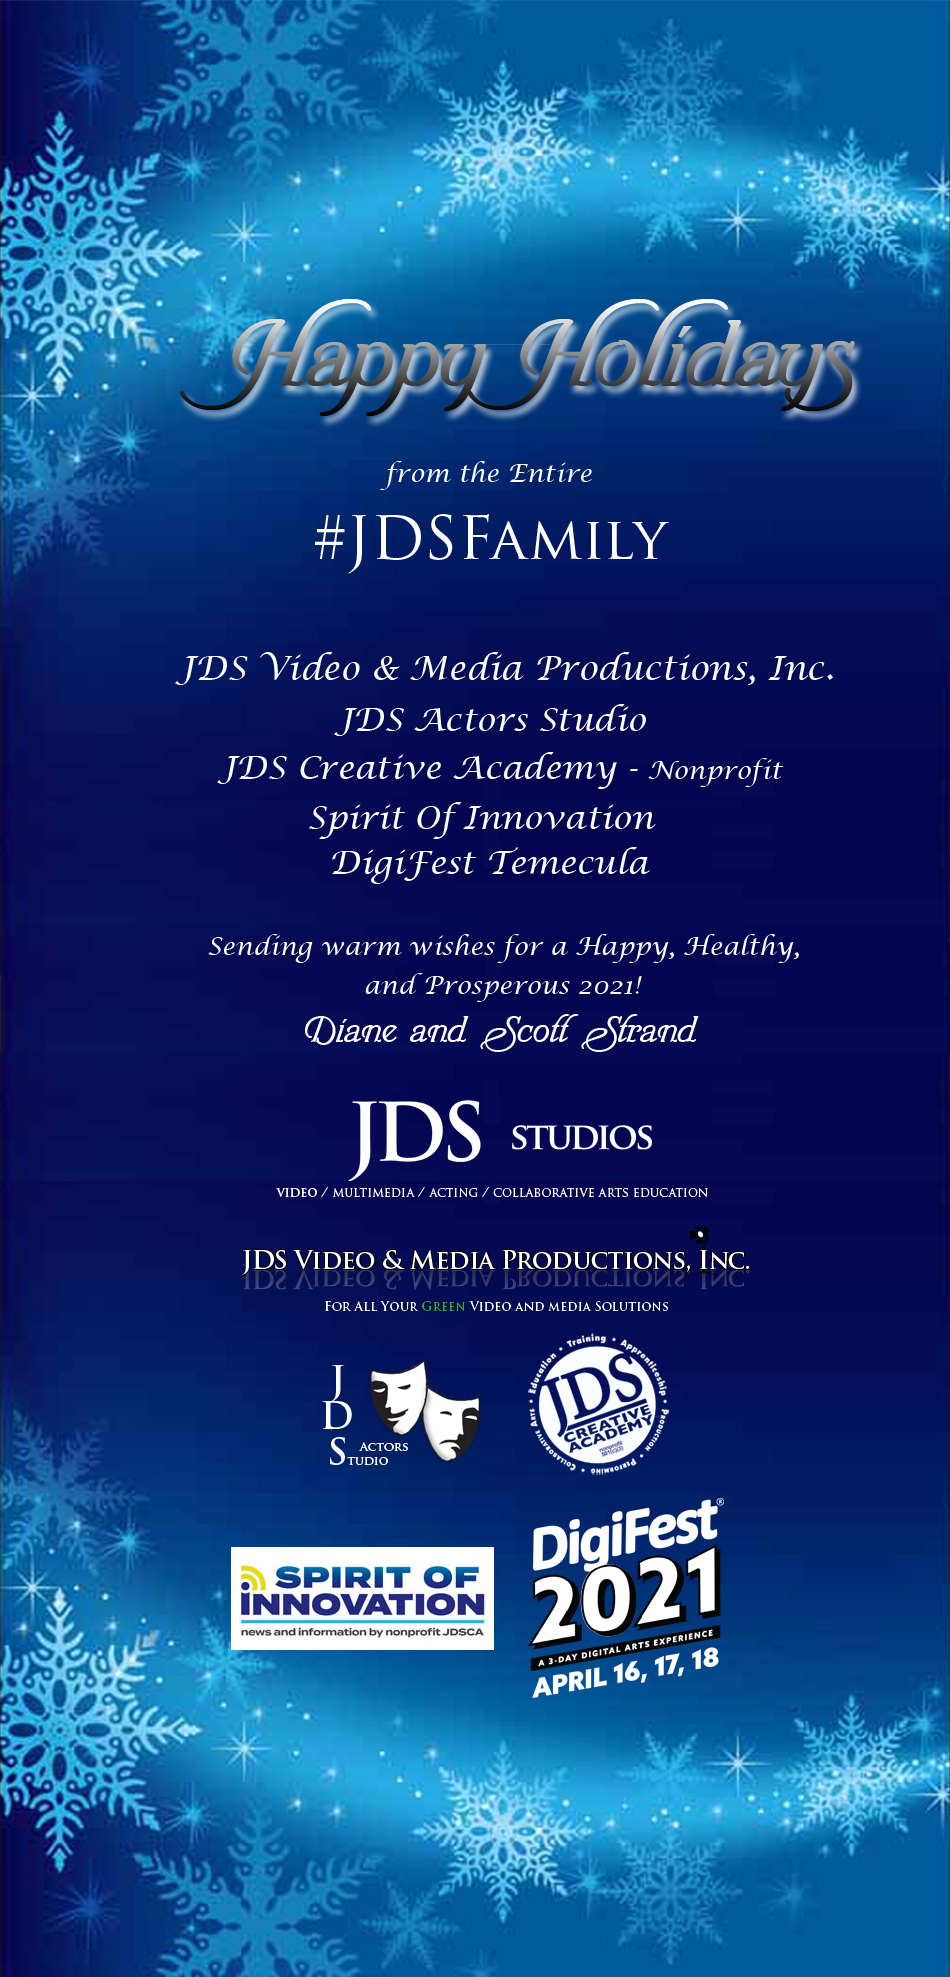 JDS Studios Happy Holidays-2020